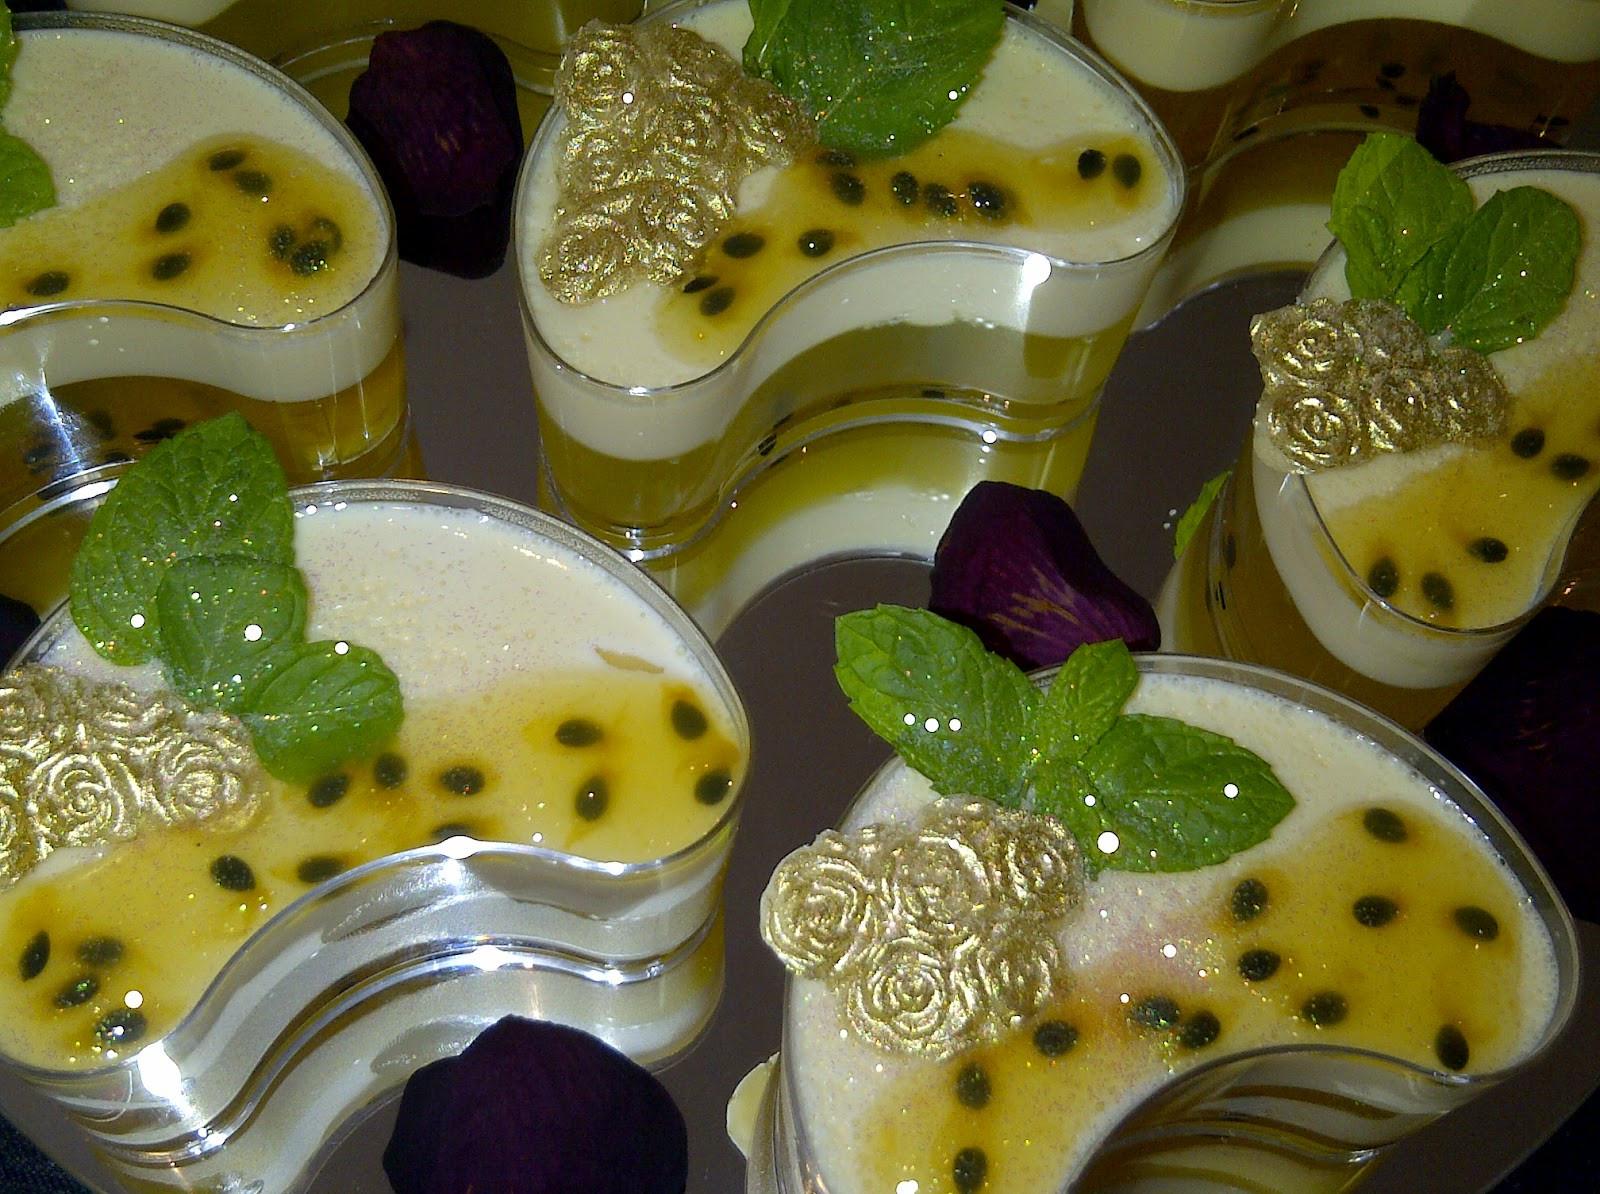 Passion Fruit Desserts  CakeWalk Passion Fruit Dessert